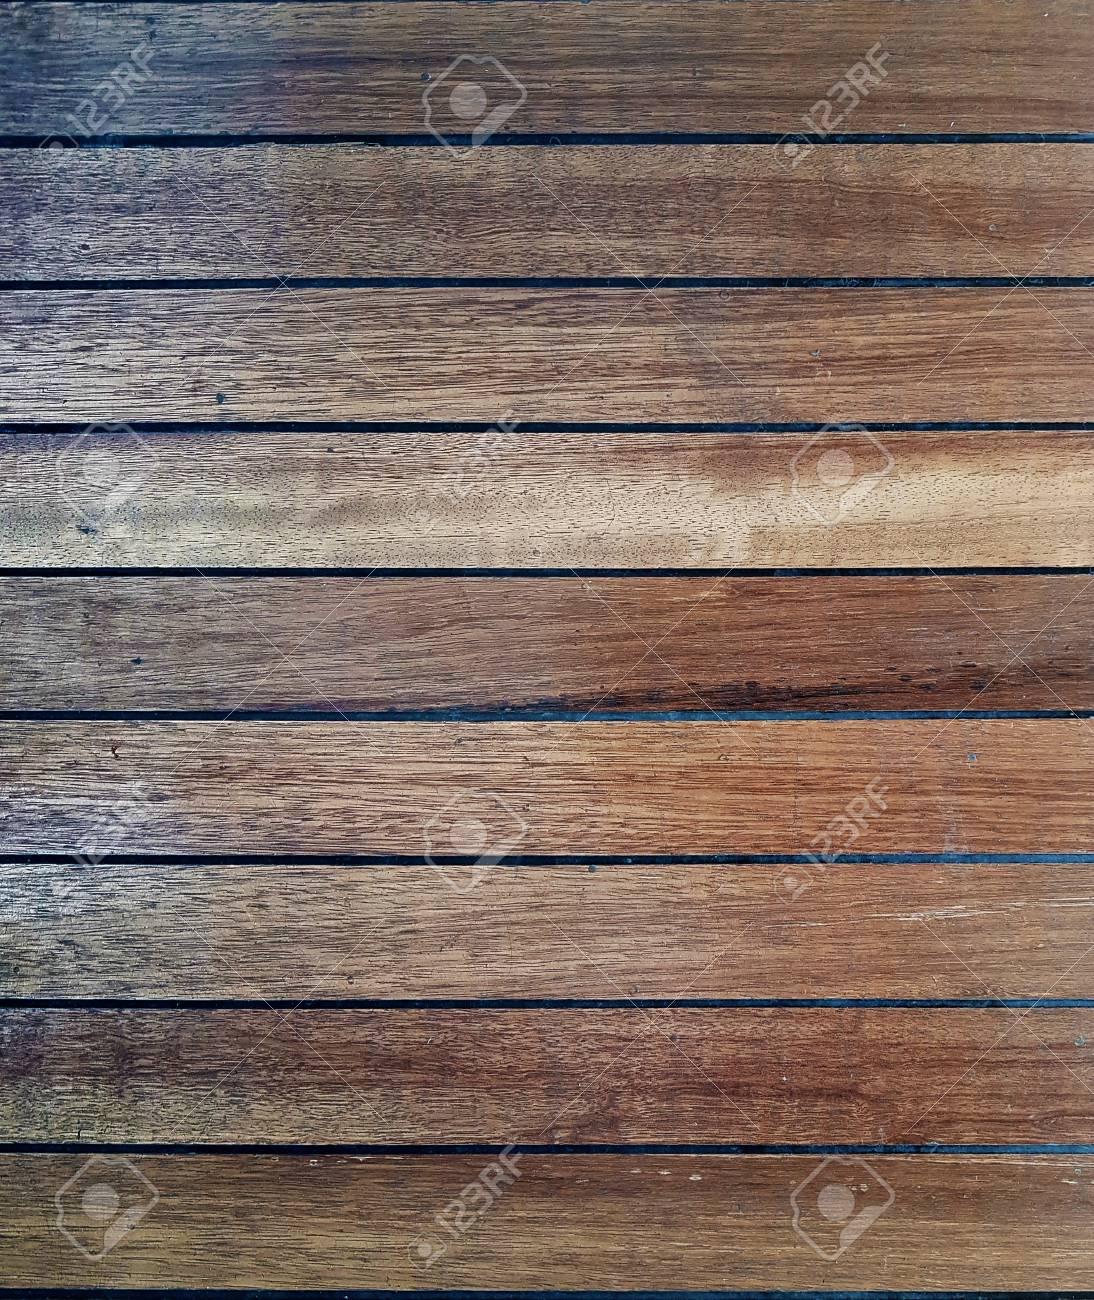 b62b3bcf4 dark slightly worn natural wood parquet tile texture Stock Photo - 82748063